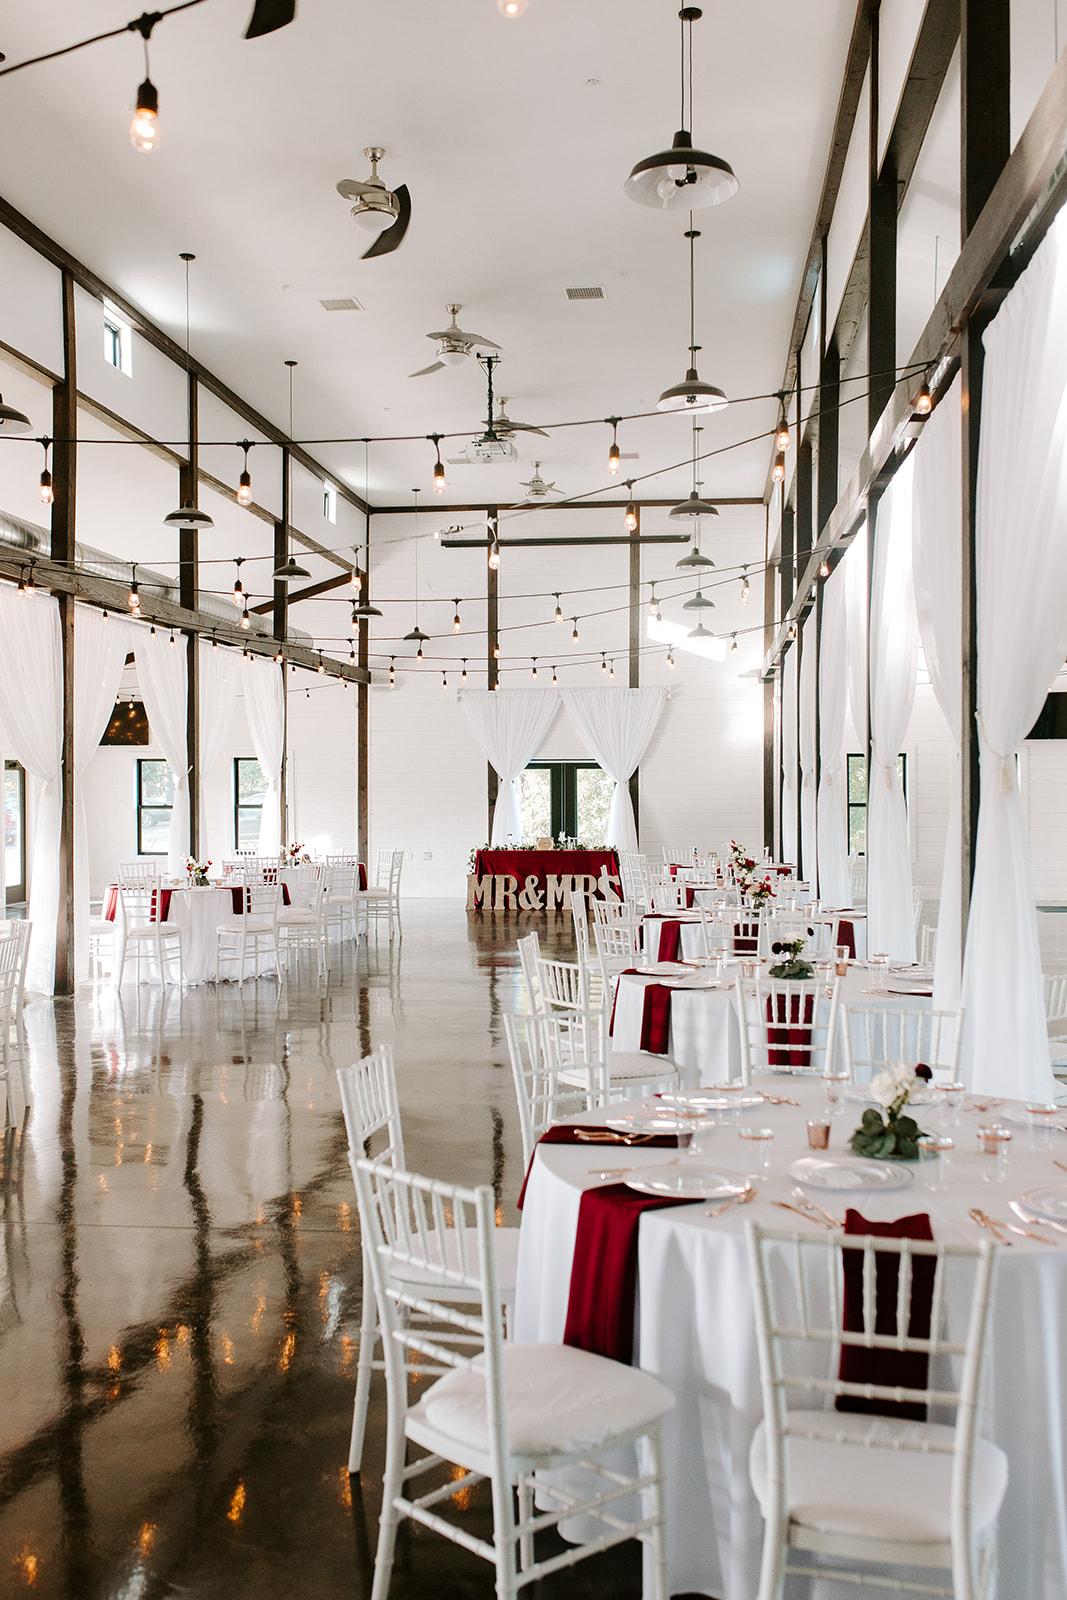 Wedding Venues in Tulsa white barn Dream Point Ranch 15.jpg